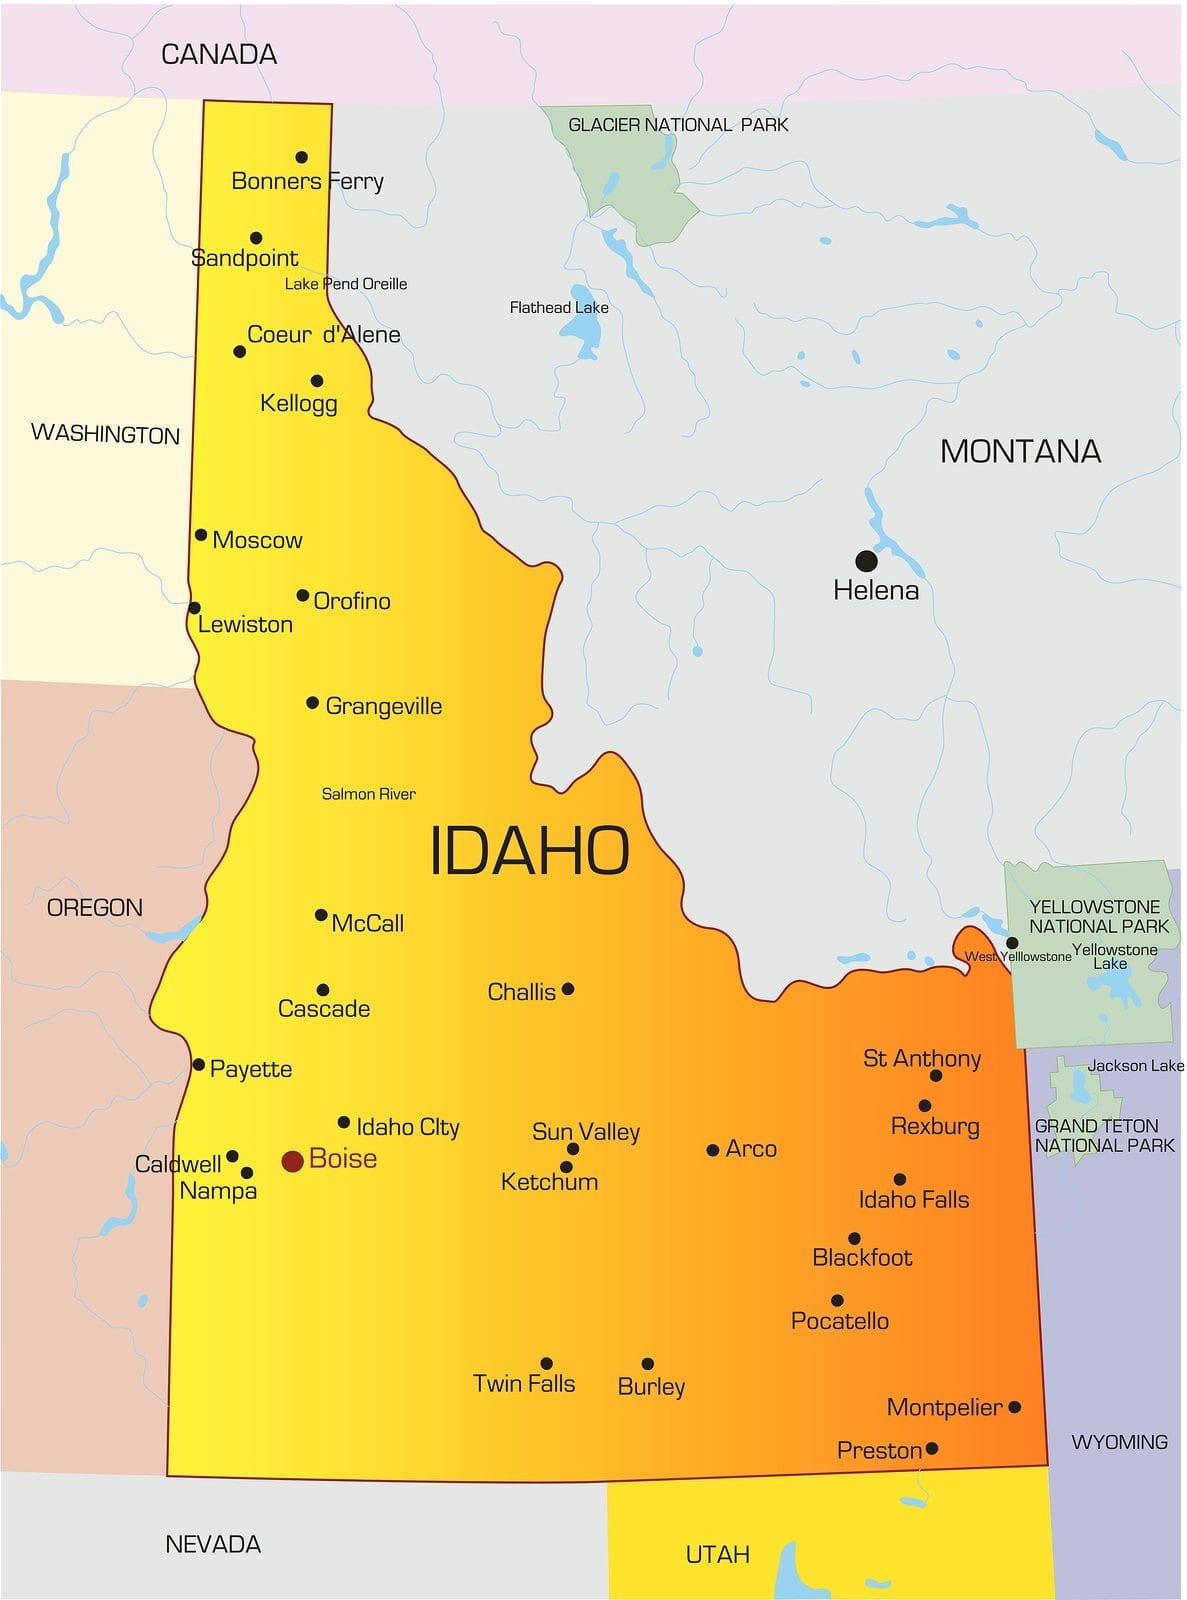 Idaho pharmacy technician requirements and training programs 1betcityfo Gallery